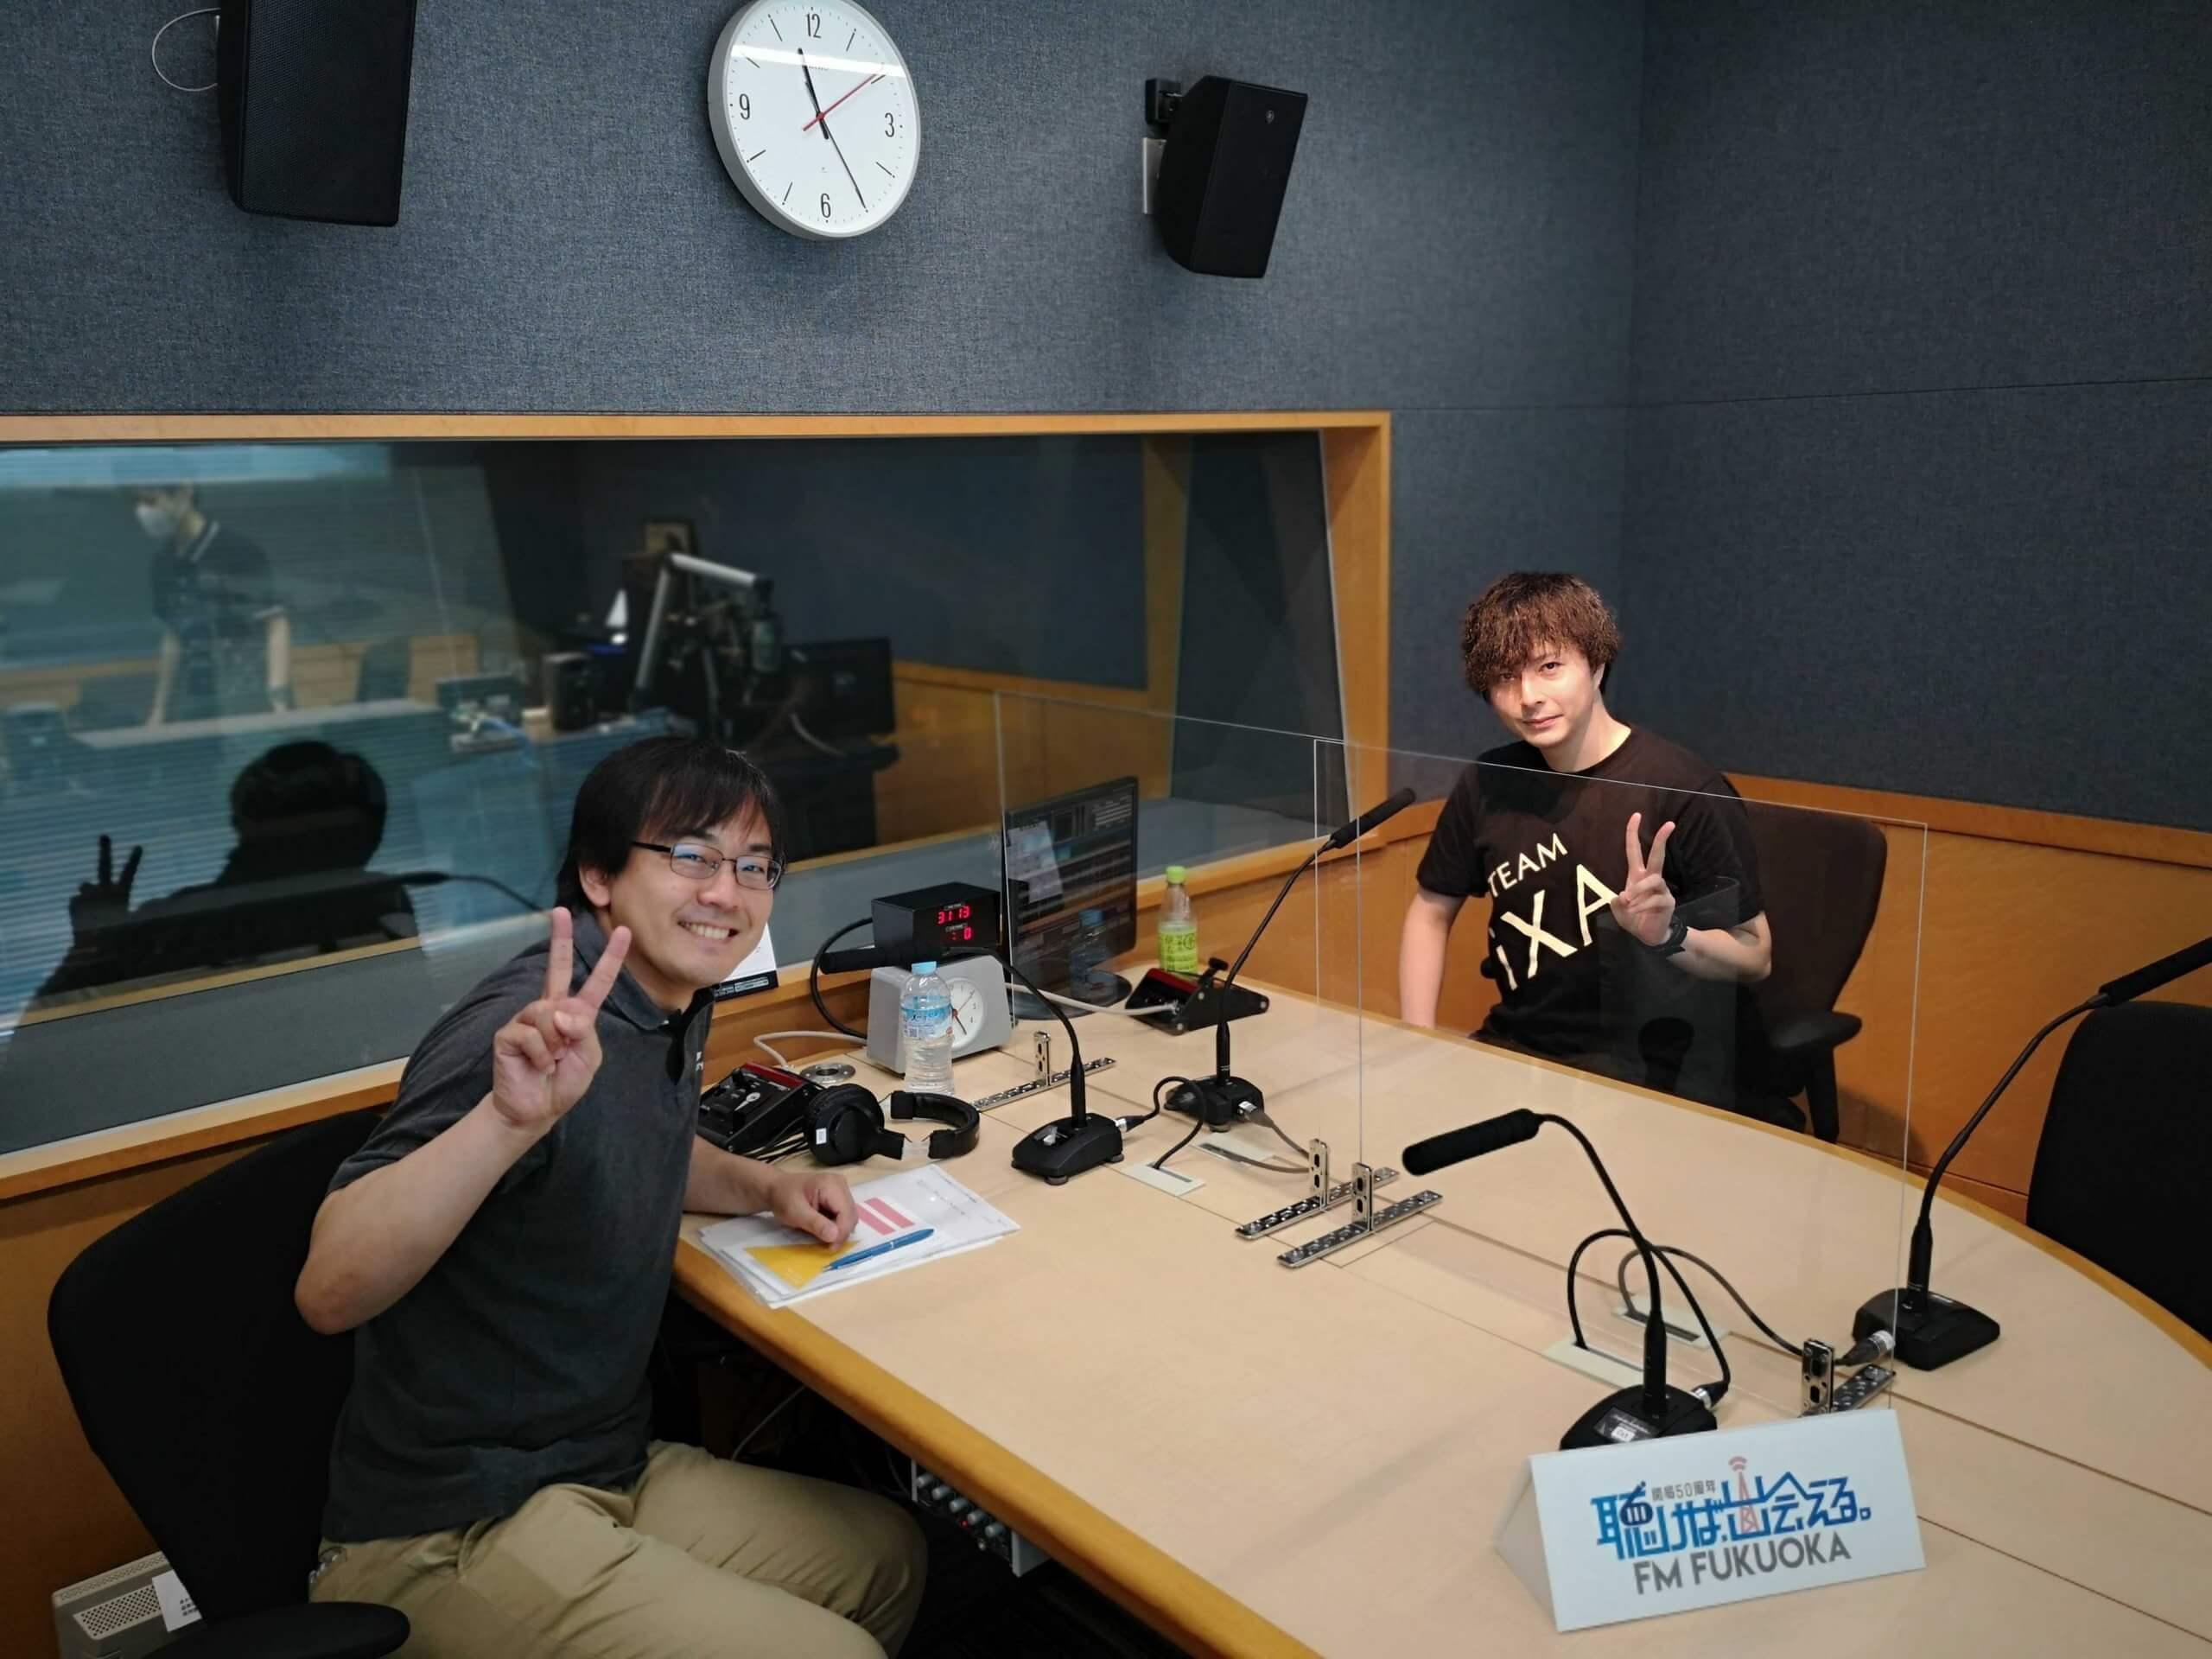 FM FUKUOKA 「Have Fun!! e-sports」に「TEAM iXA」のじゃじい選手が出演しました!